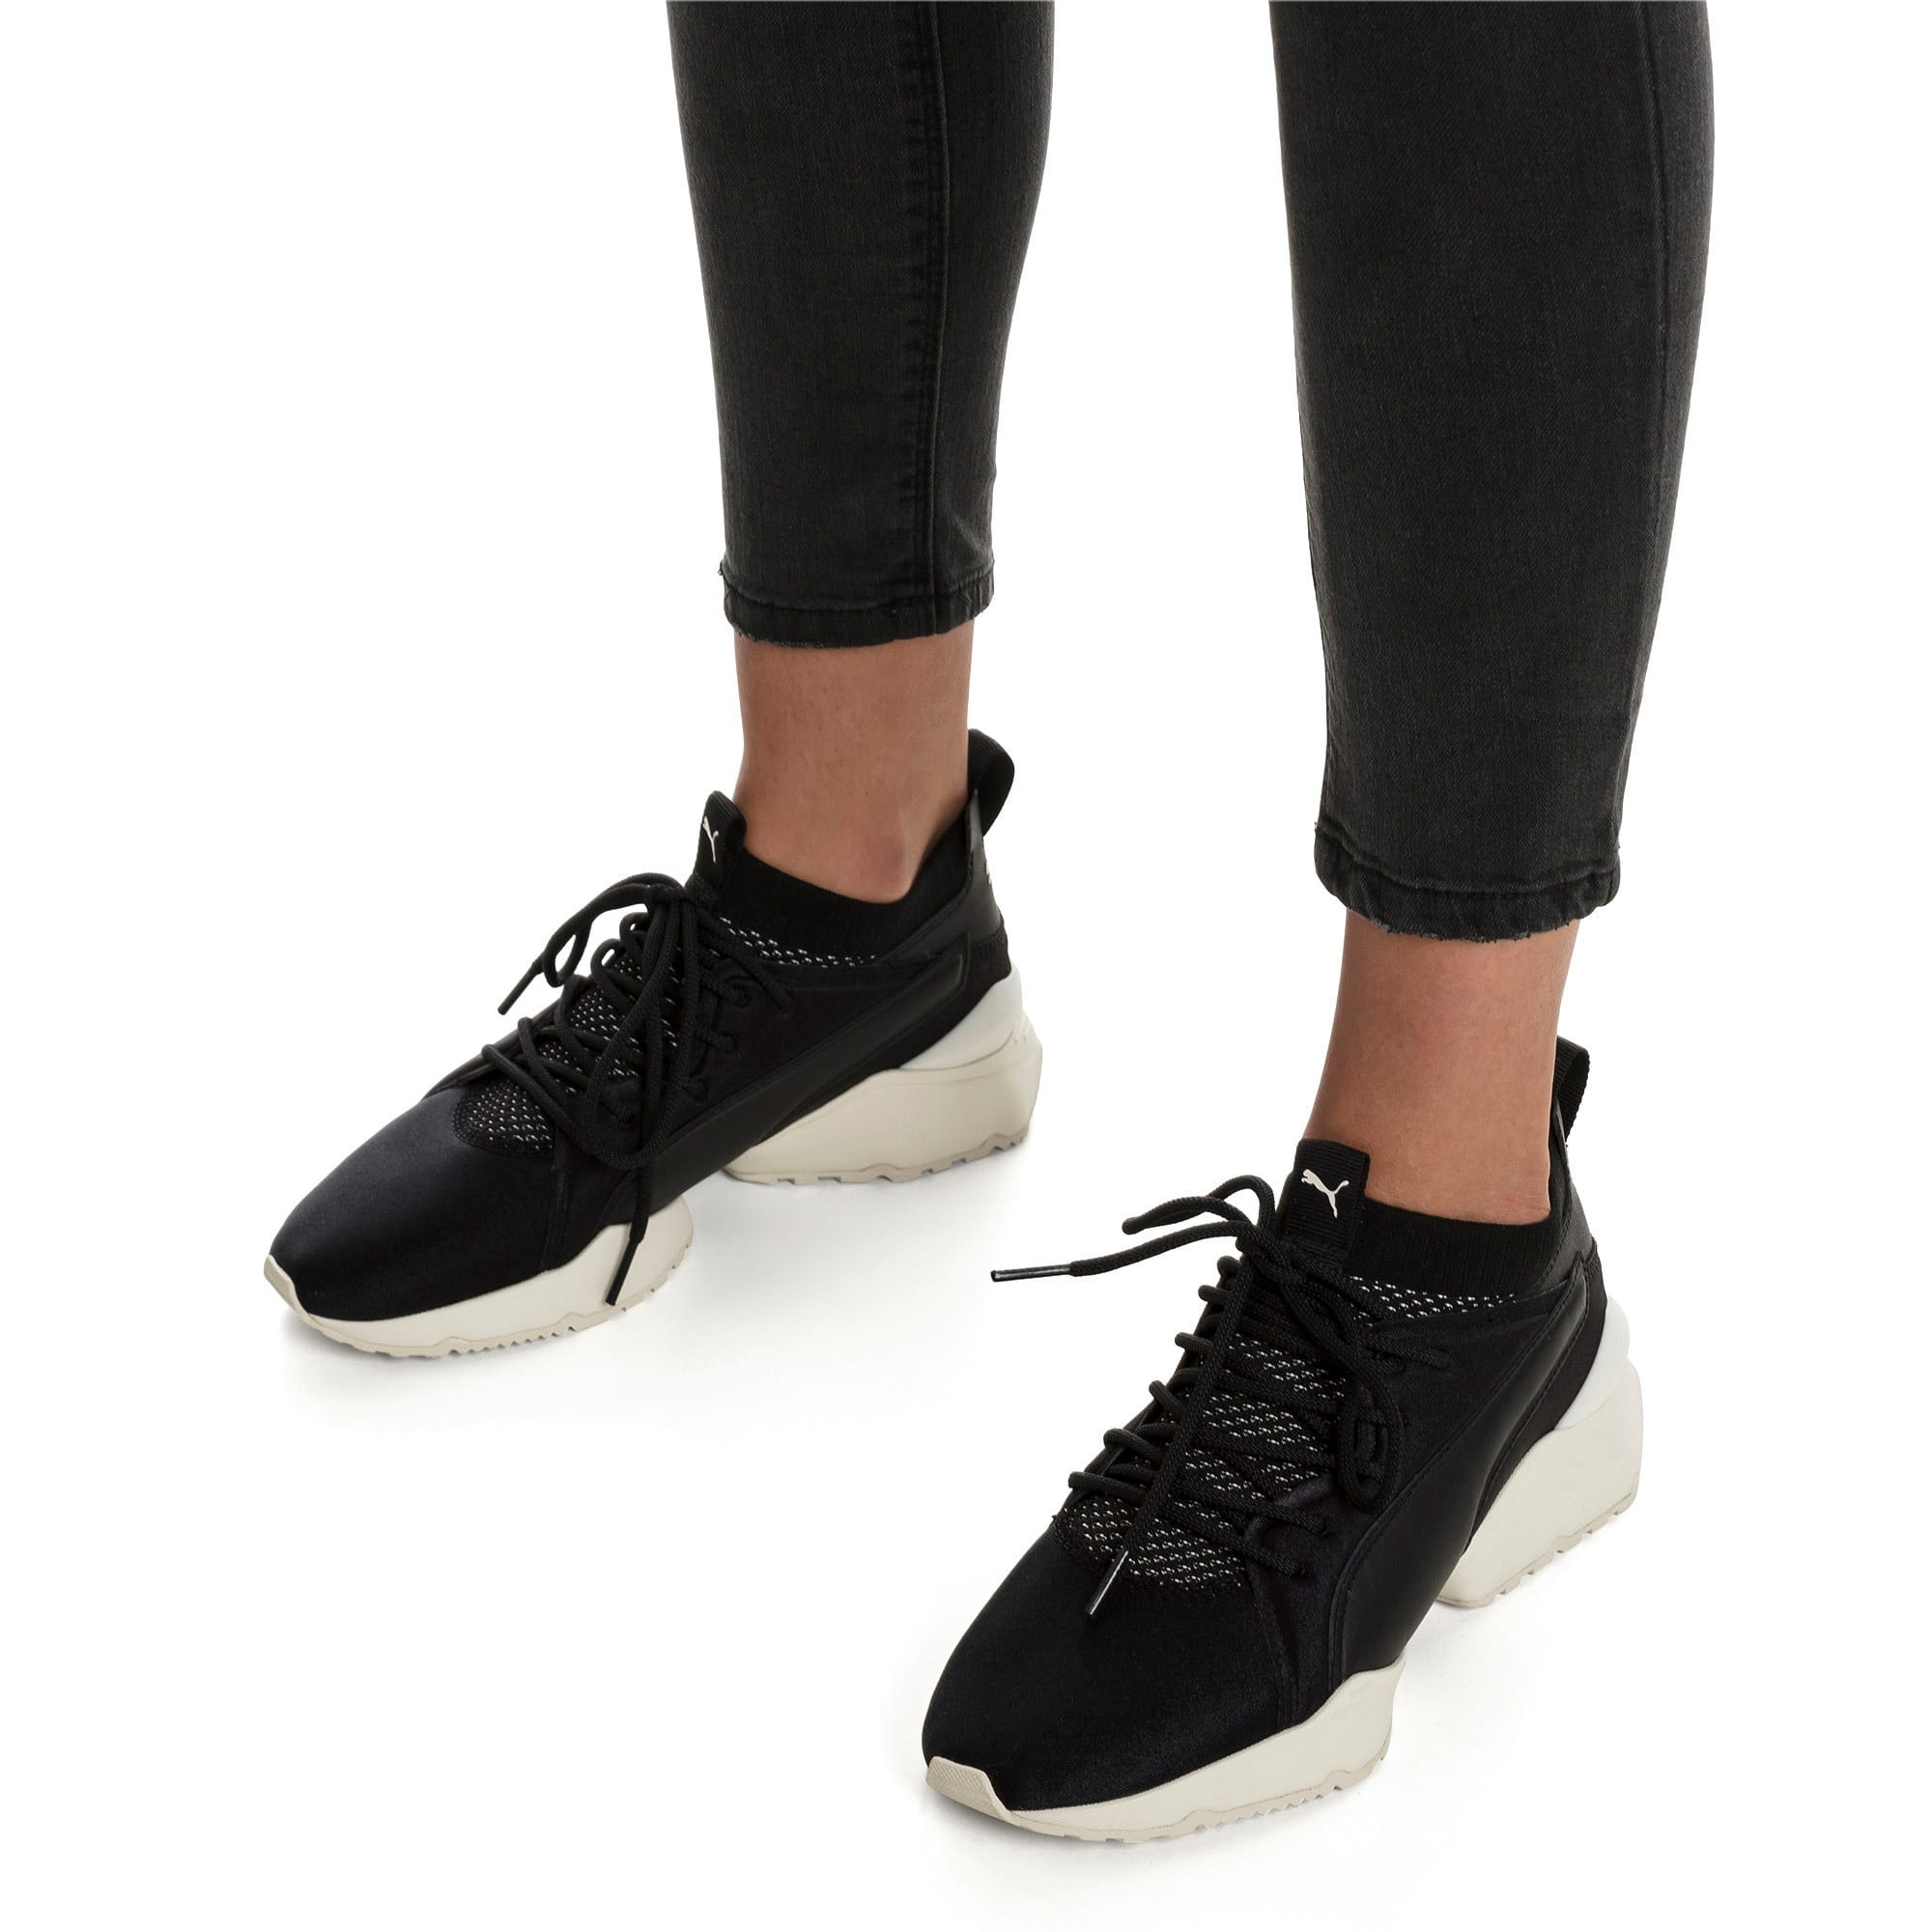 Thumbnail 2 of Muse Maia Knit Premium Damen Sneaker, Puma Black-Whisper White, medium